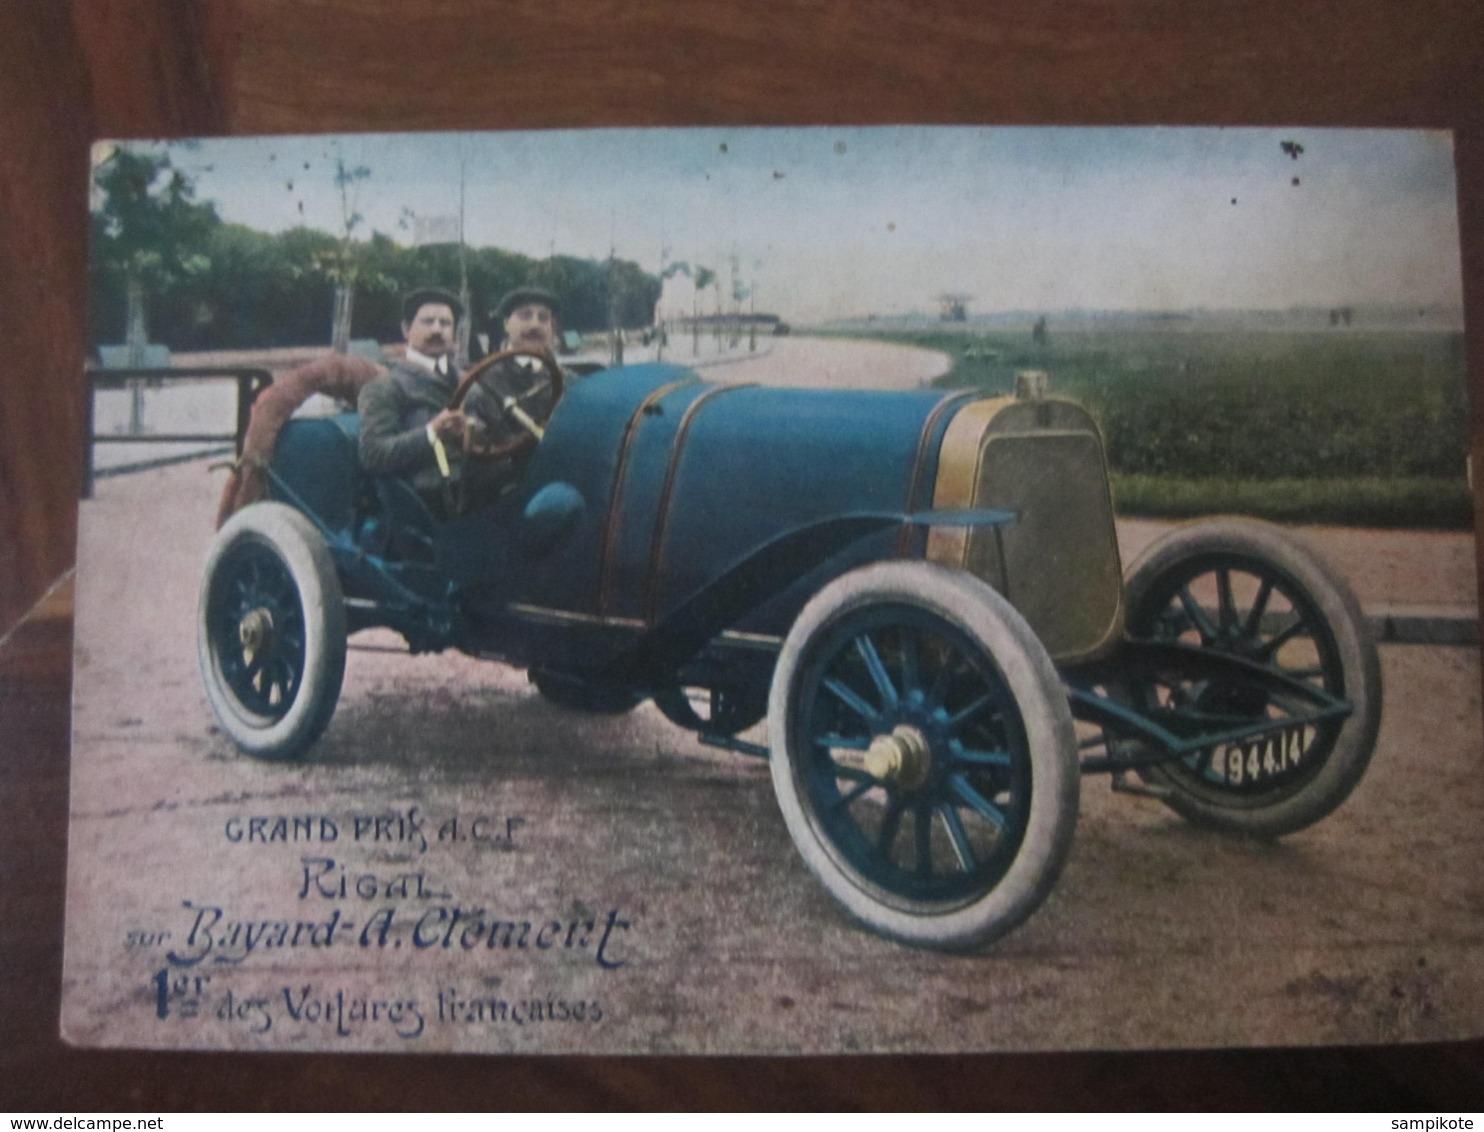 Carte Postale Voiture Ancienne Grand Prix ACF Bayard - A.Clément - Cartoline